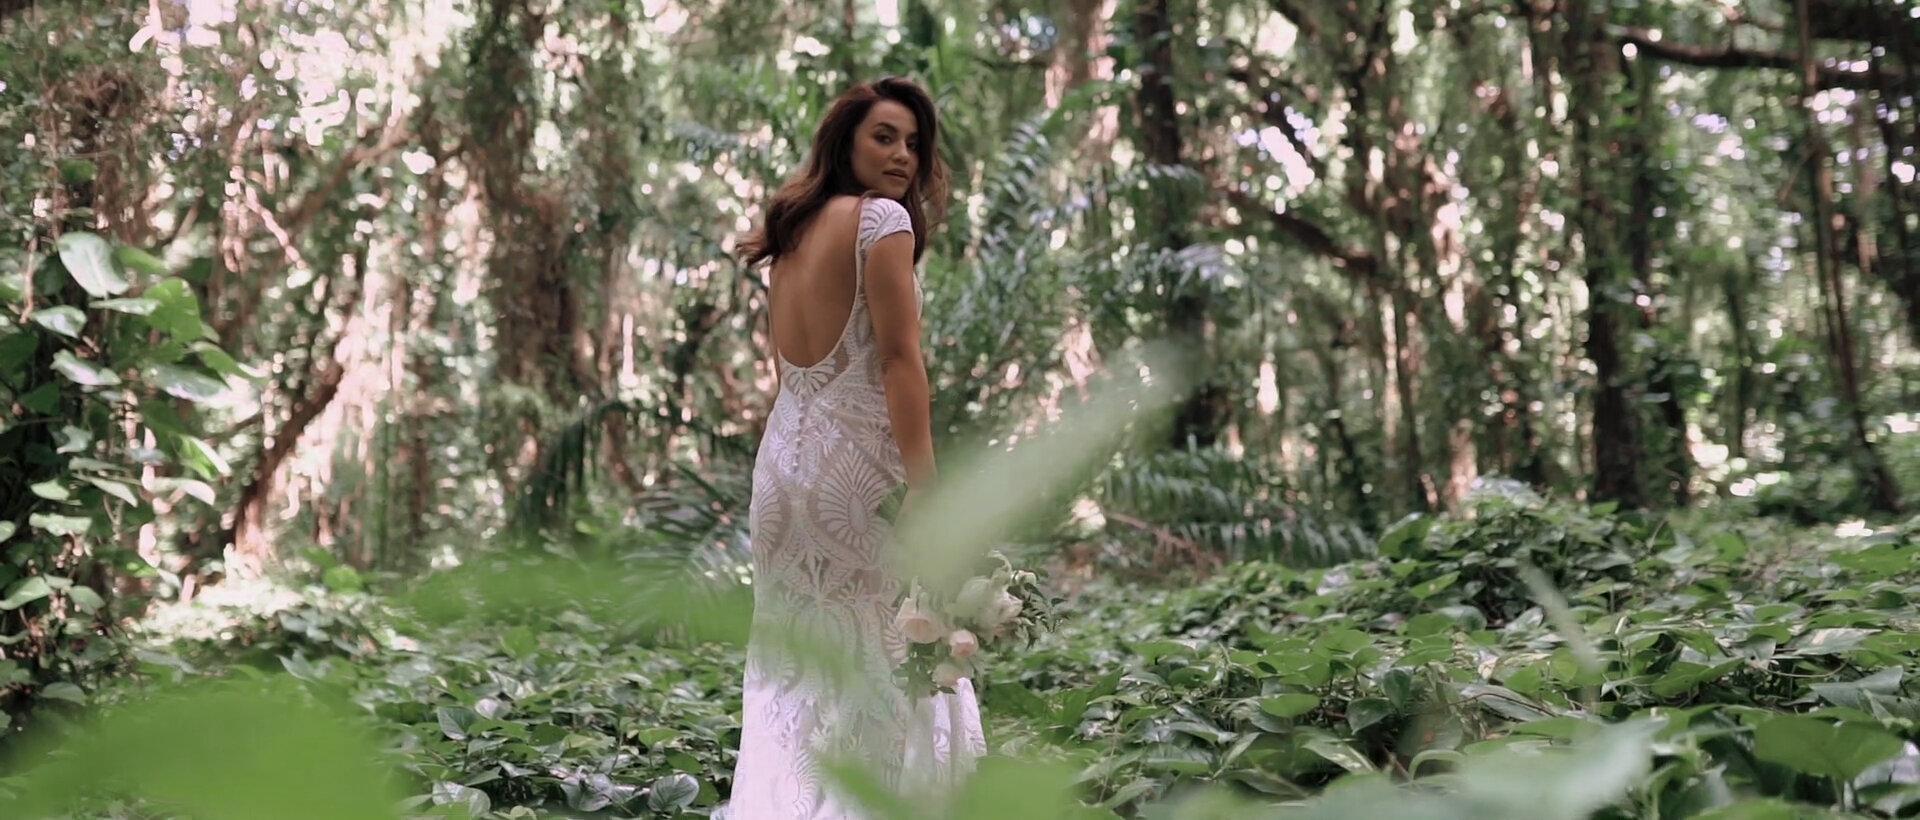 Bride in dress walking at Honolua Bay Forest